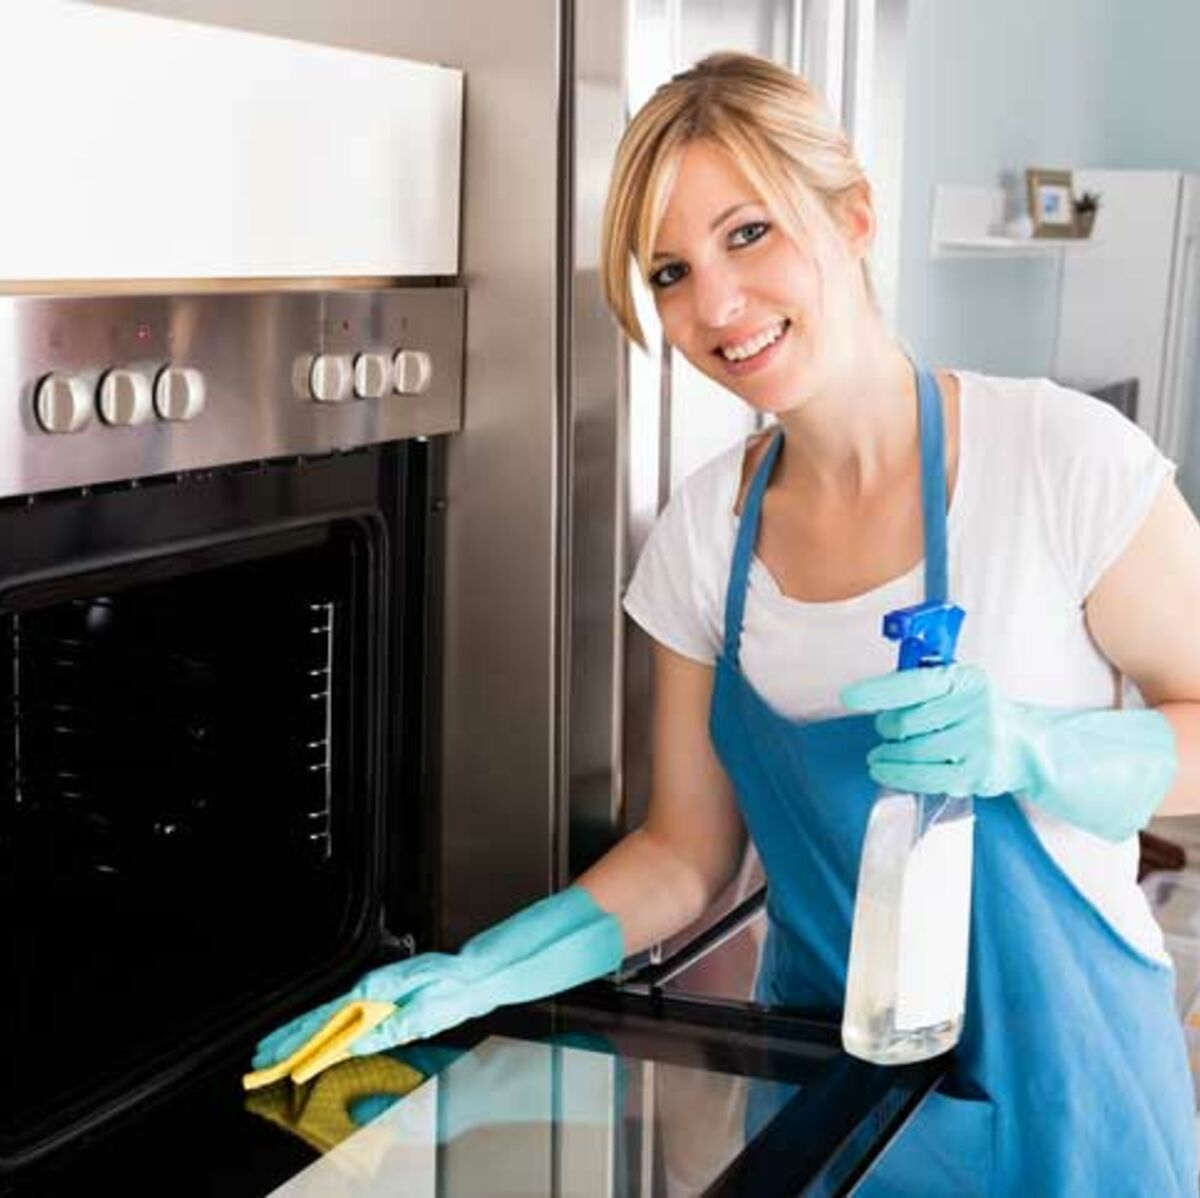 Difference Nettoyage Four Catalyse Ou Pyrolyse comment nettoyer son four sans produits toxiques : femme